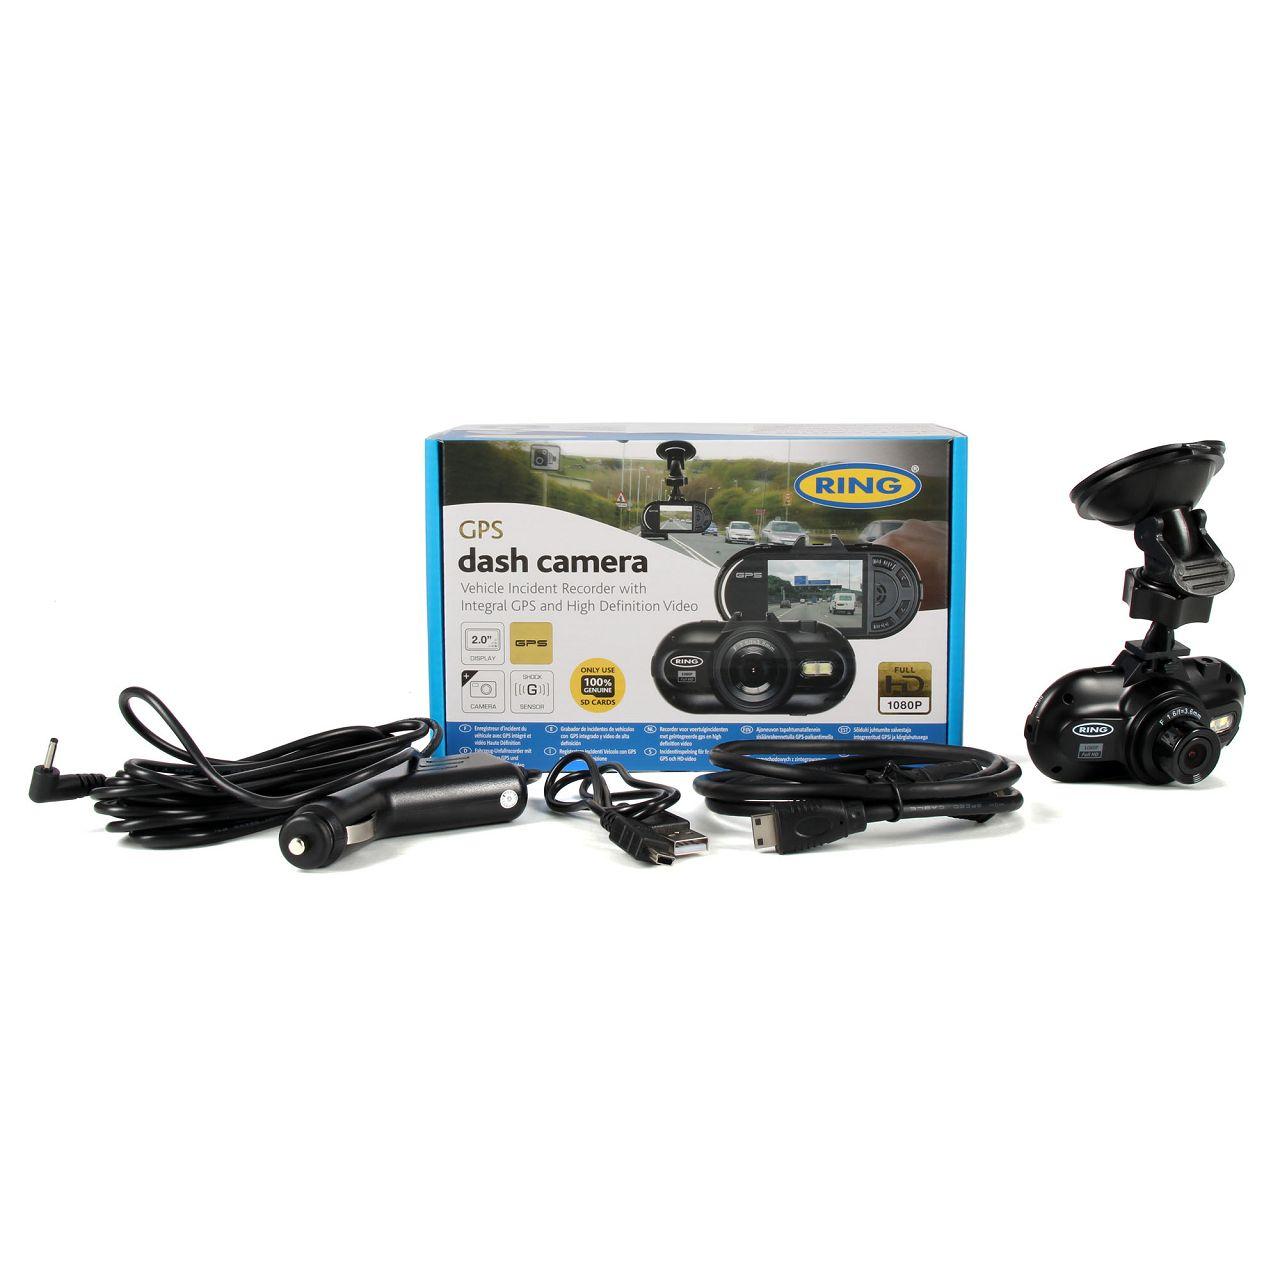 RING Dashcam Autokamera Überwachungskamera GPS Full HD Videocam RBGDC200